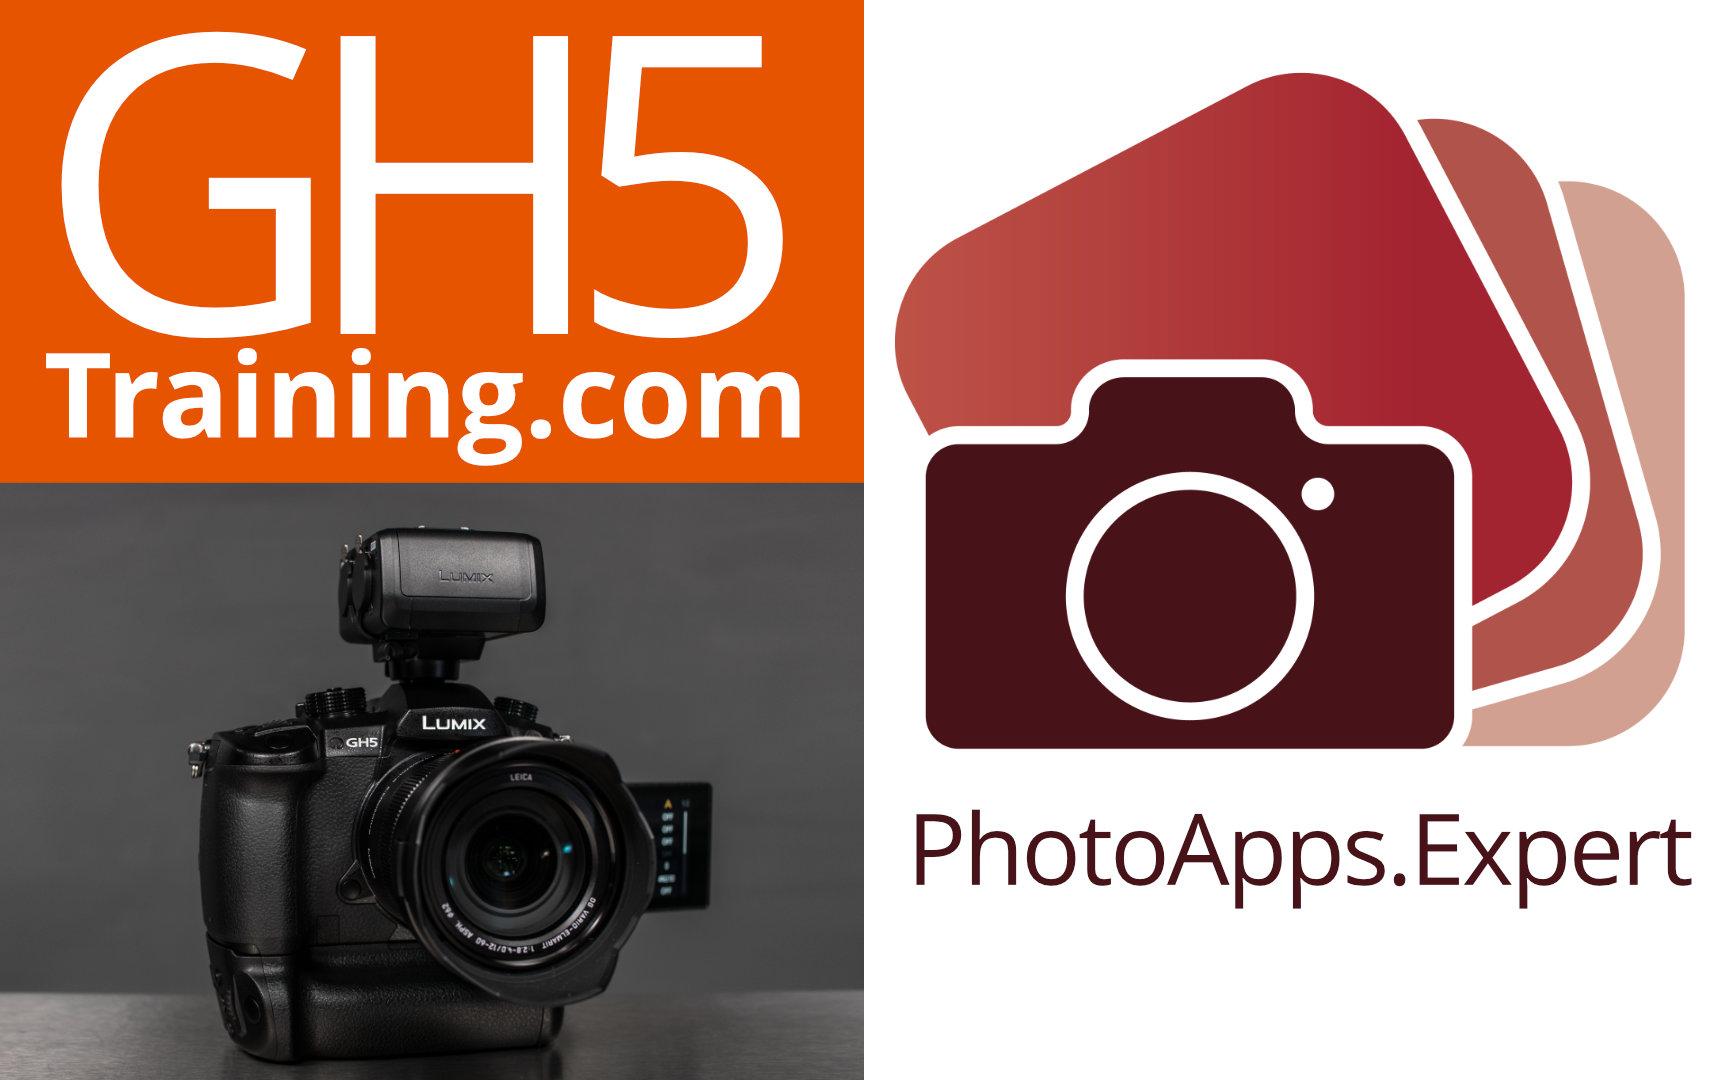 gleam-gh5-and-photoapps-social-media-contest.jpg